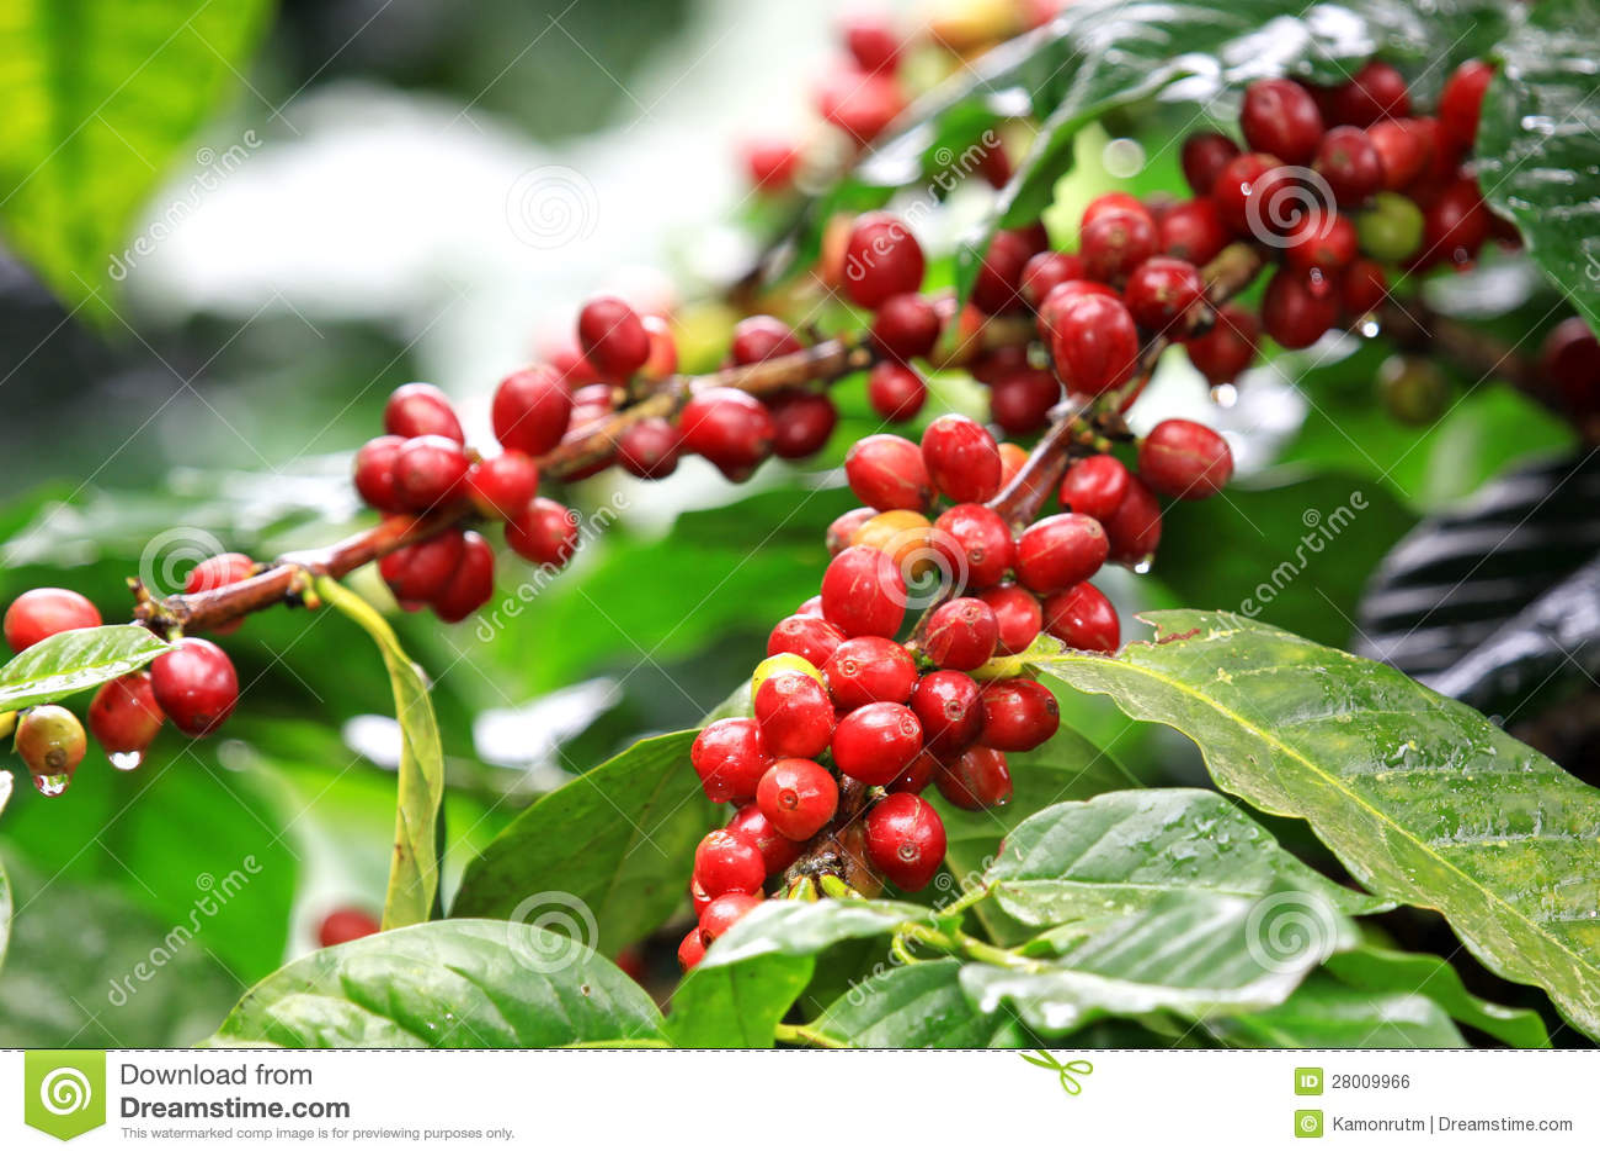 Granos de café que maduran en árbol